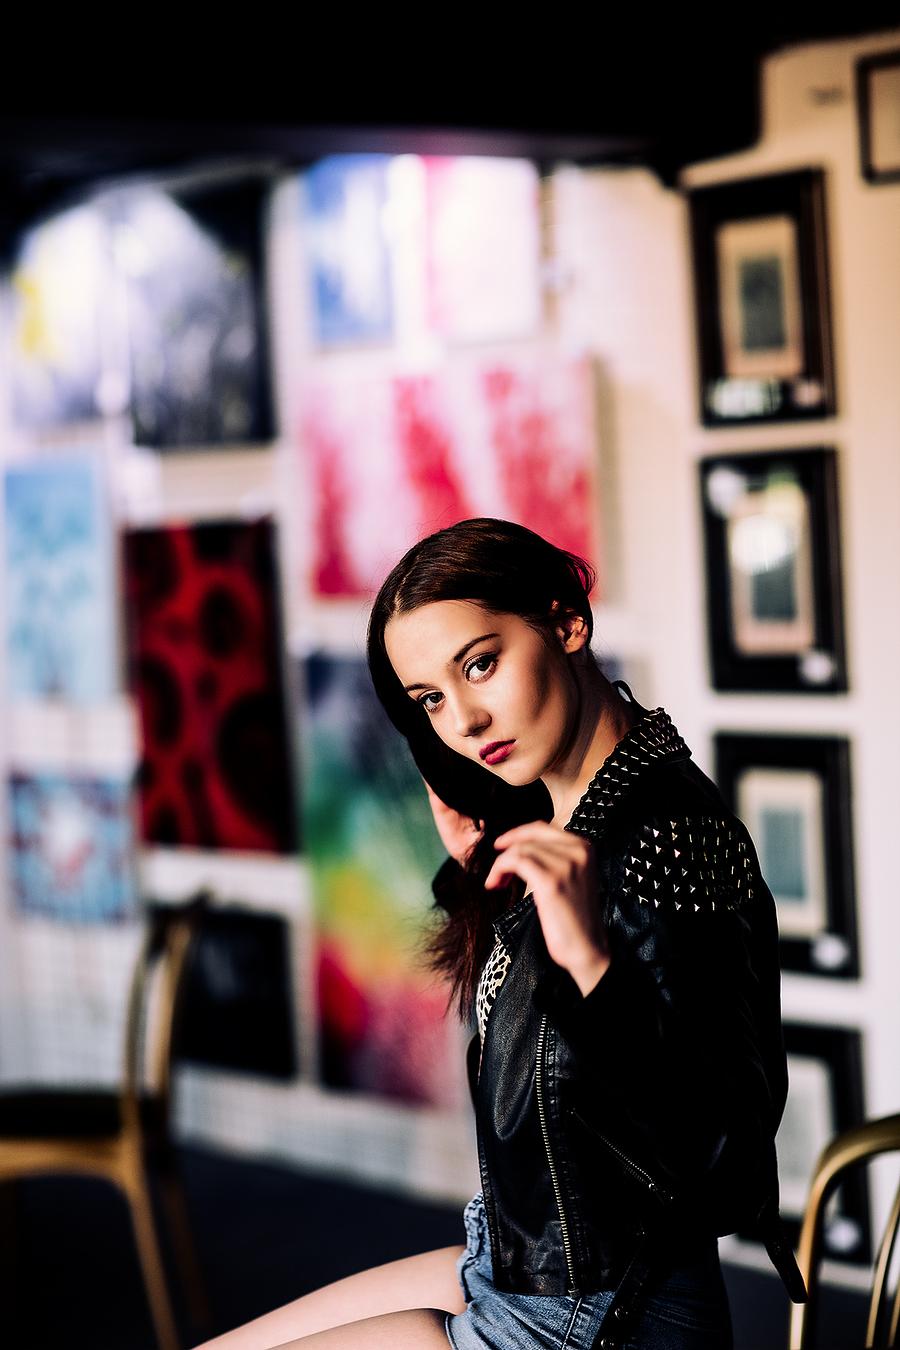 Portrait in the gallery / Photography by jakabi, Model Dominika Lowicka, Post processing by jakabi, Taken at Art Asylum Reloaded Photo Studio / Uploaded 19th July 2016 @ 11:24 PM